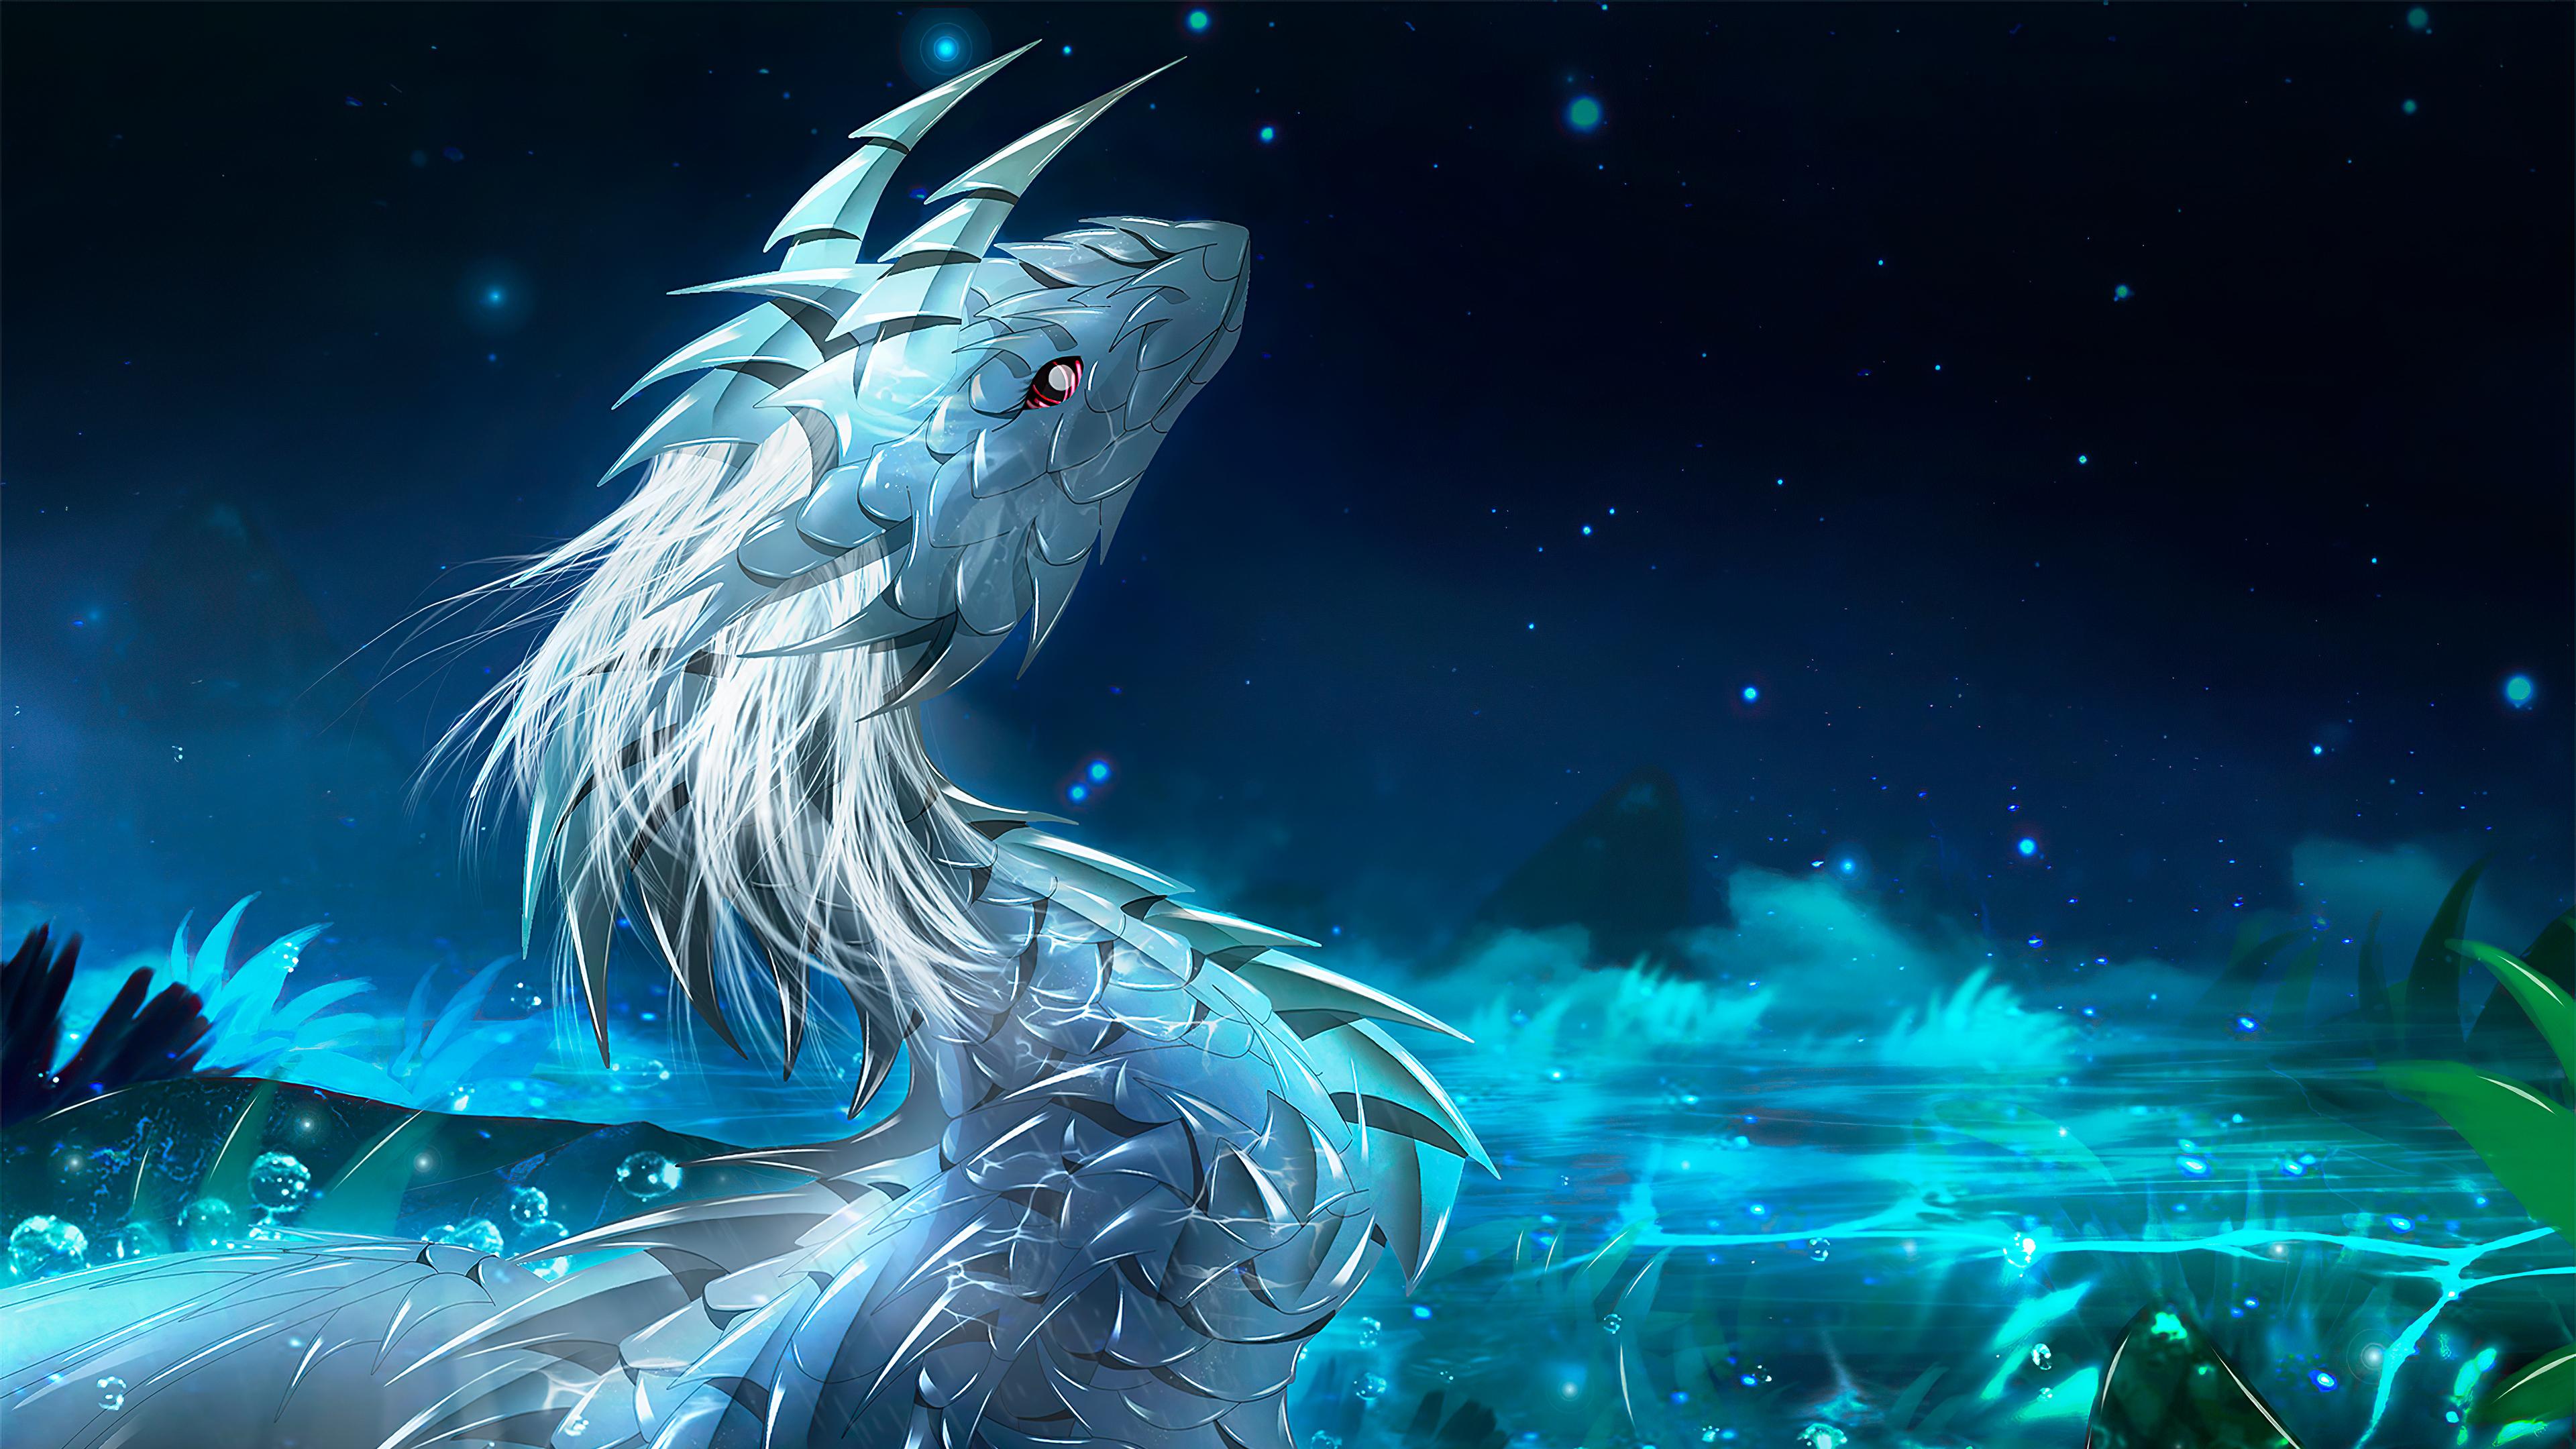 Fantasy Dragon 3840x2160